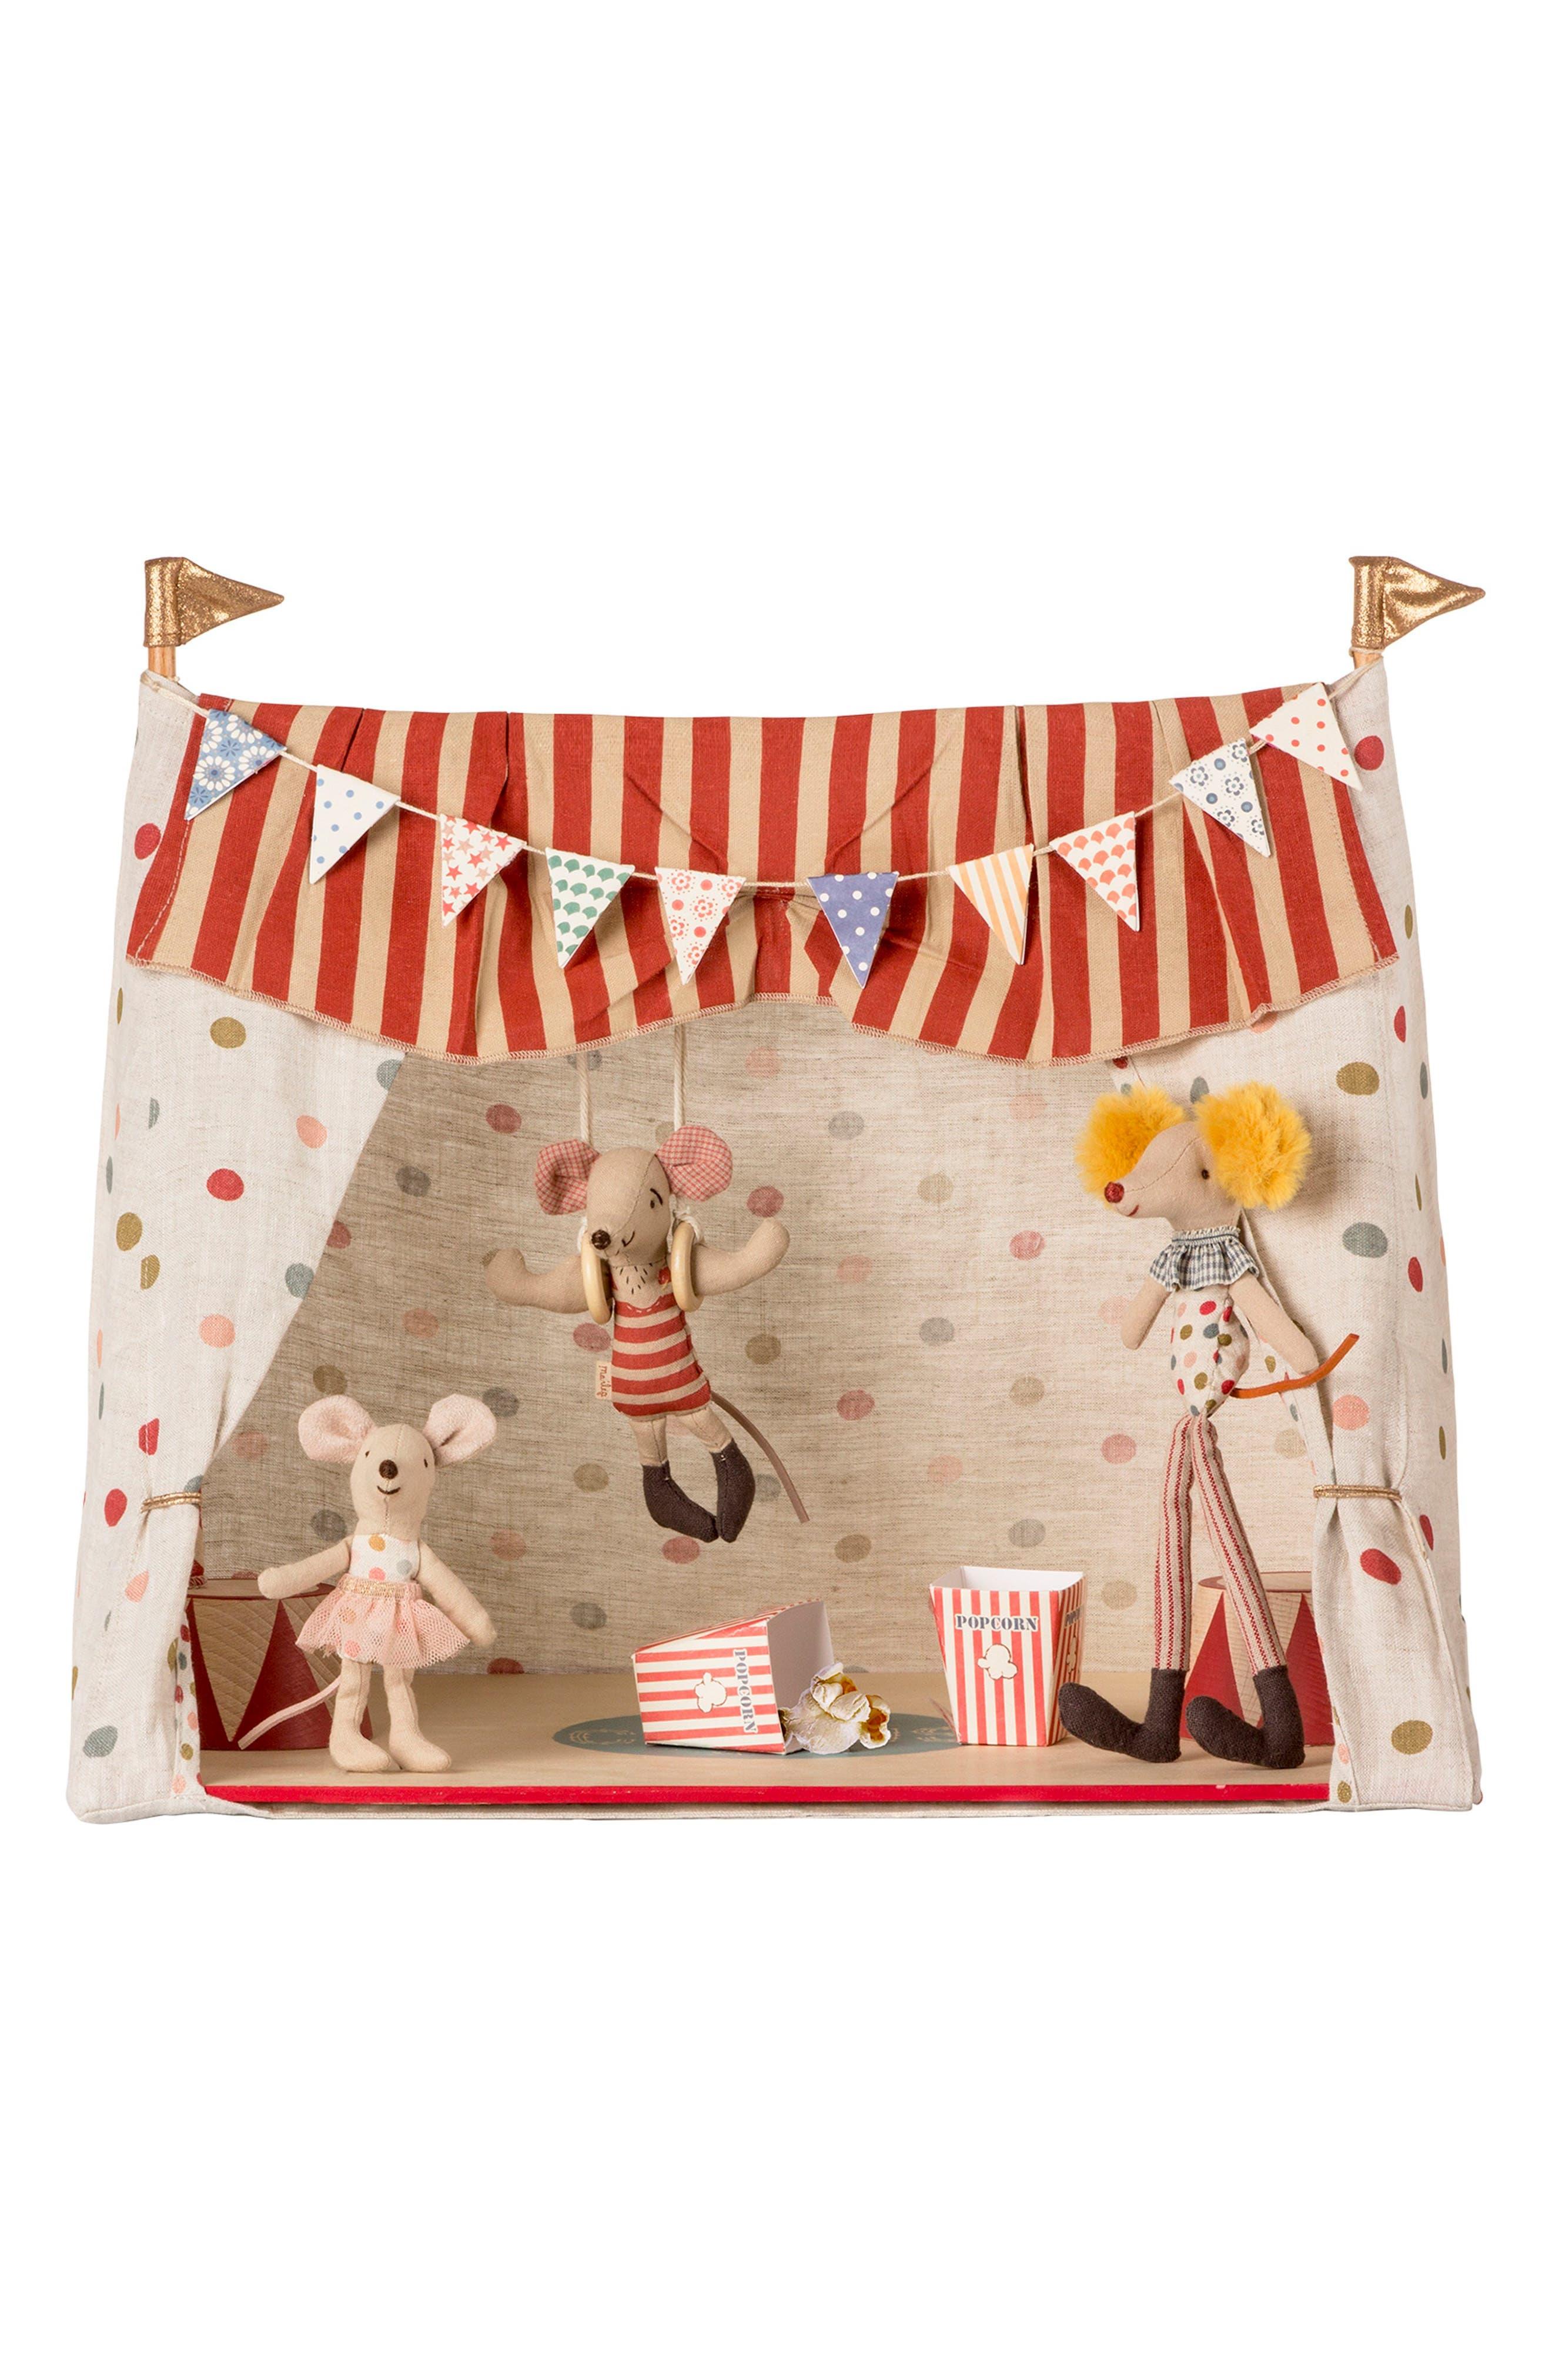 Circus Mice Play Set,                         Main,                         color, MULTI